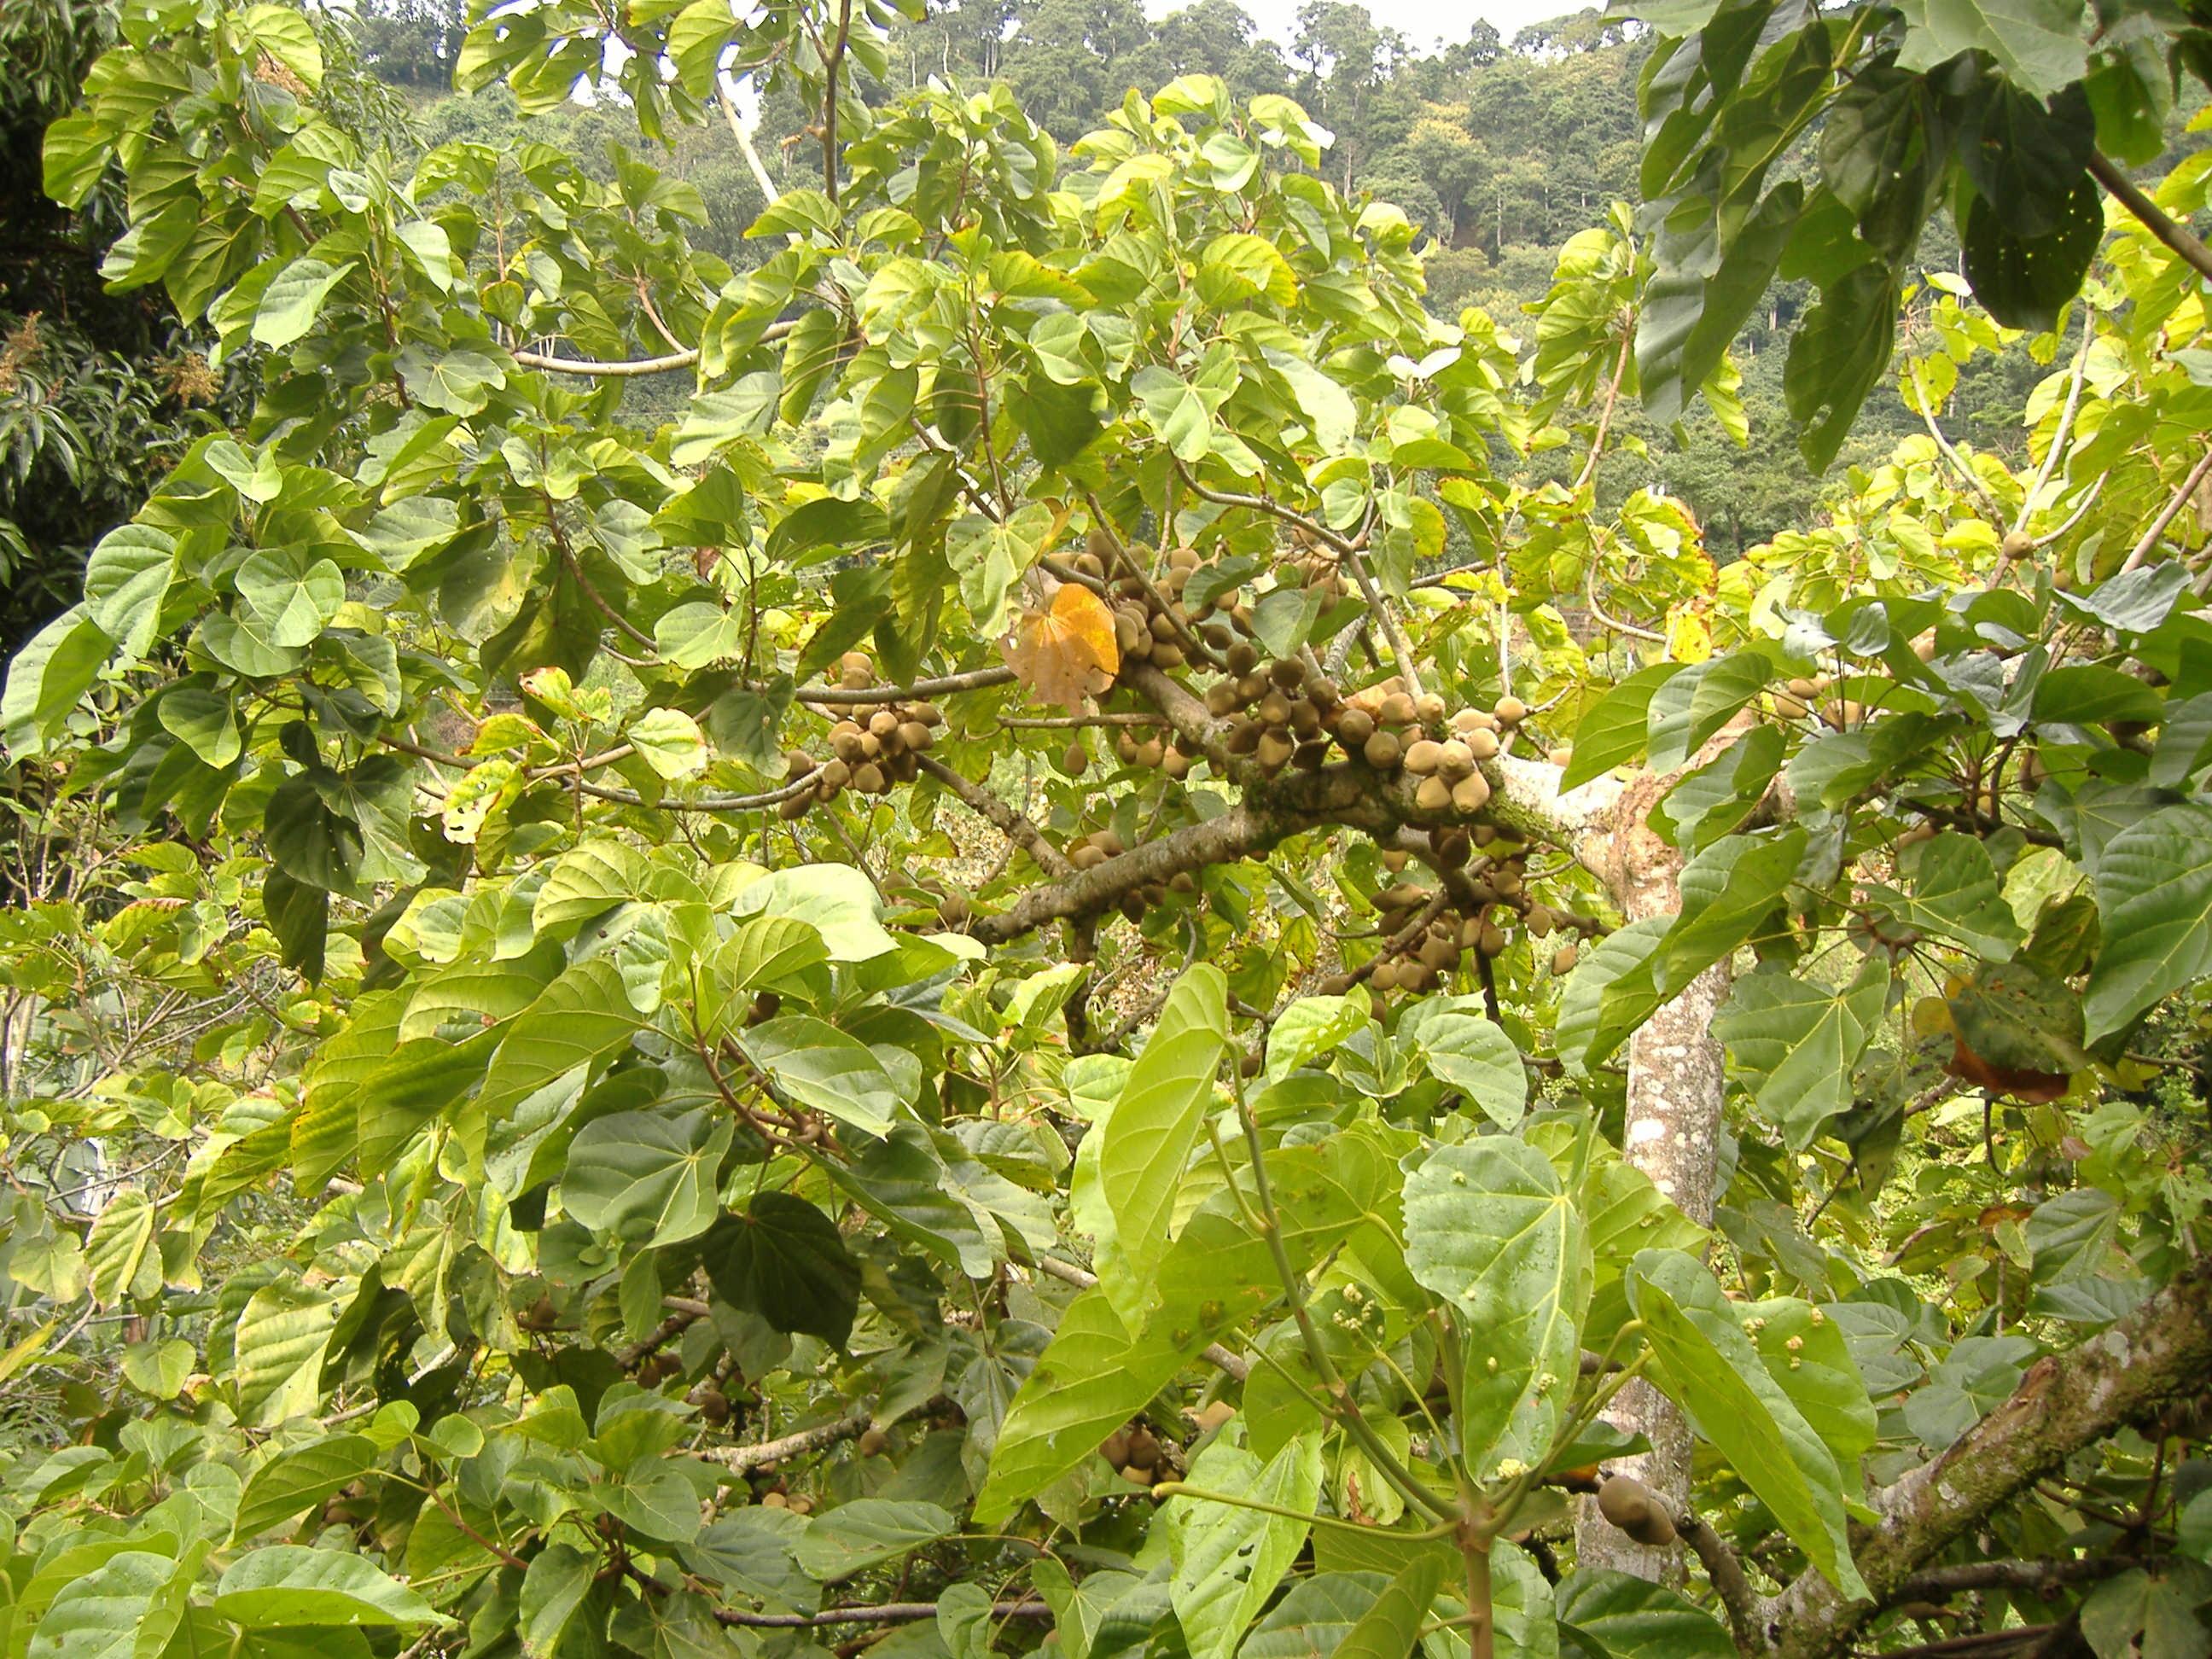 Arbre Fruitier D Intérieur quararibea cordata — wikipédia